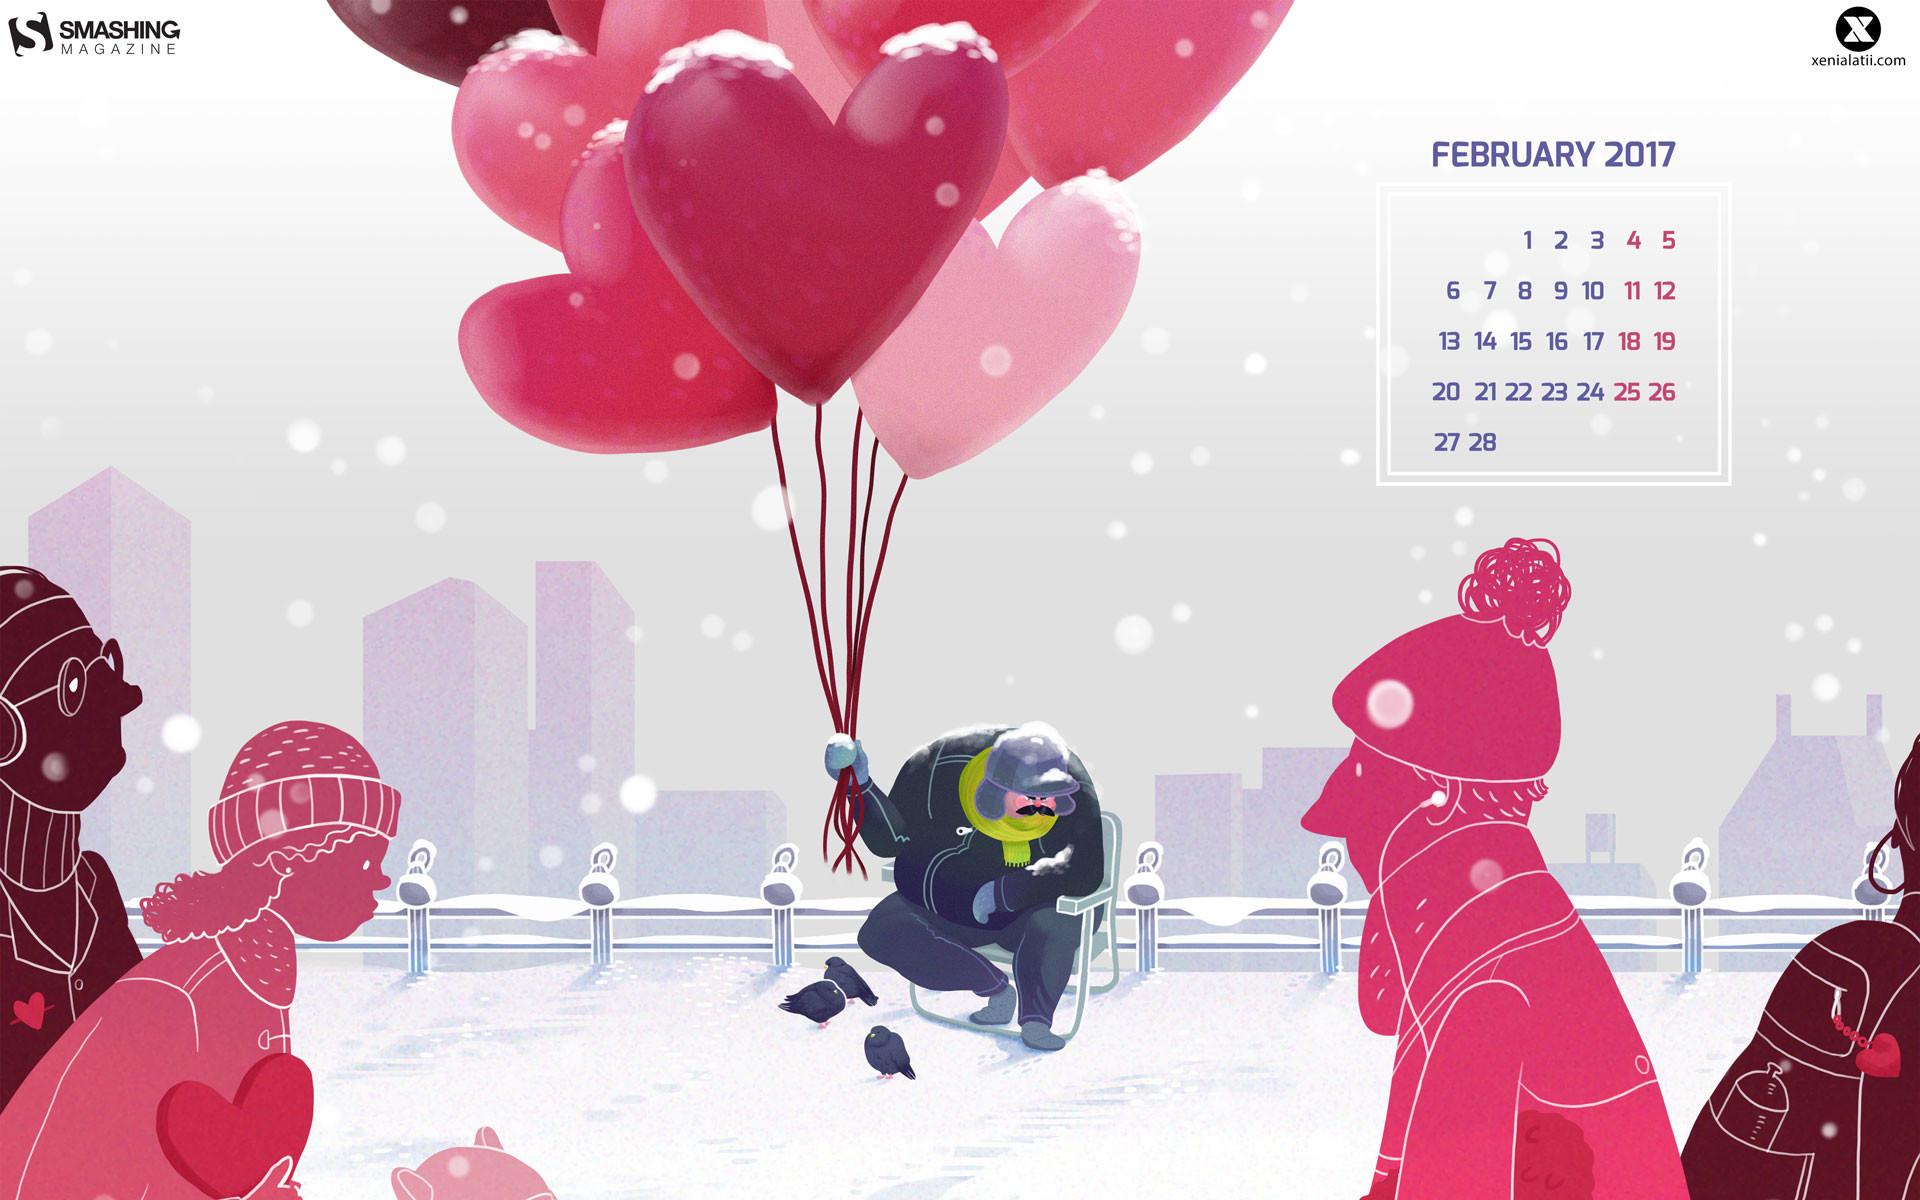 Smashing Magazine Wallpaper February 2015   Picseriocom 1920x1200